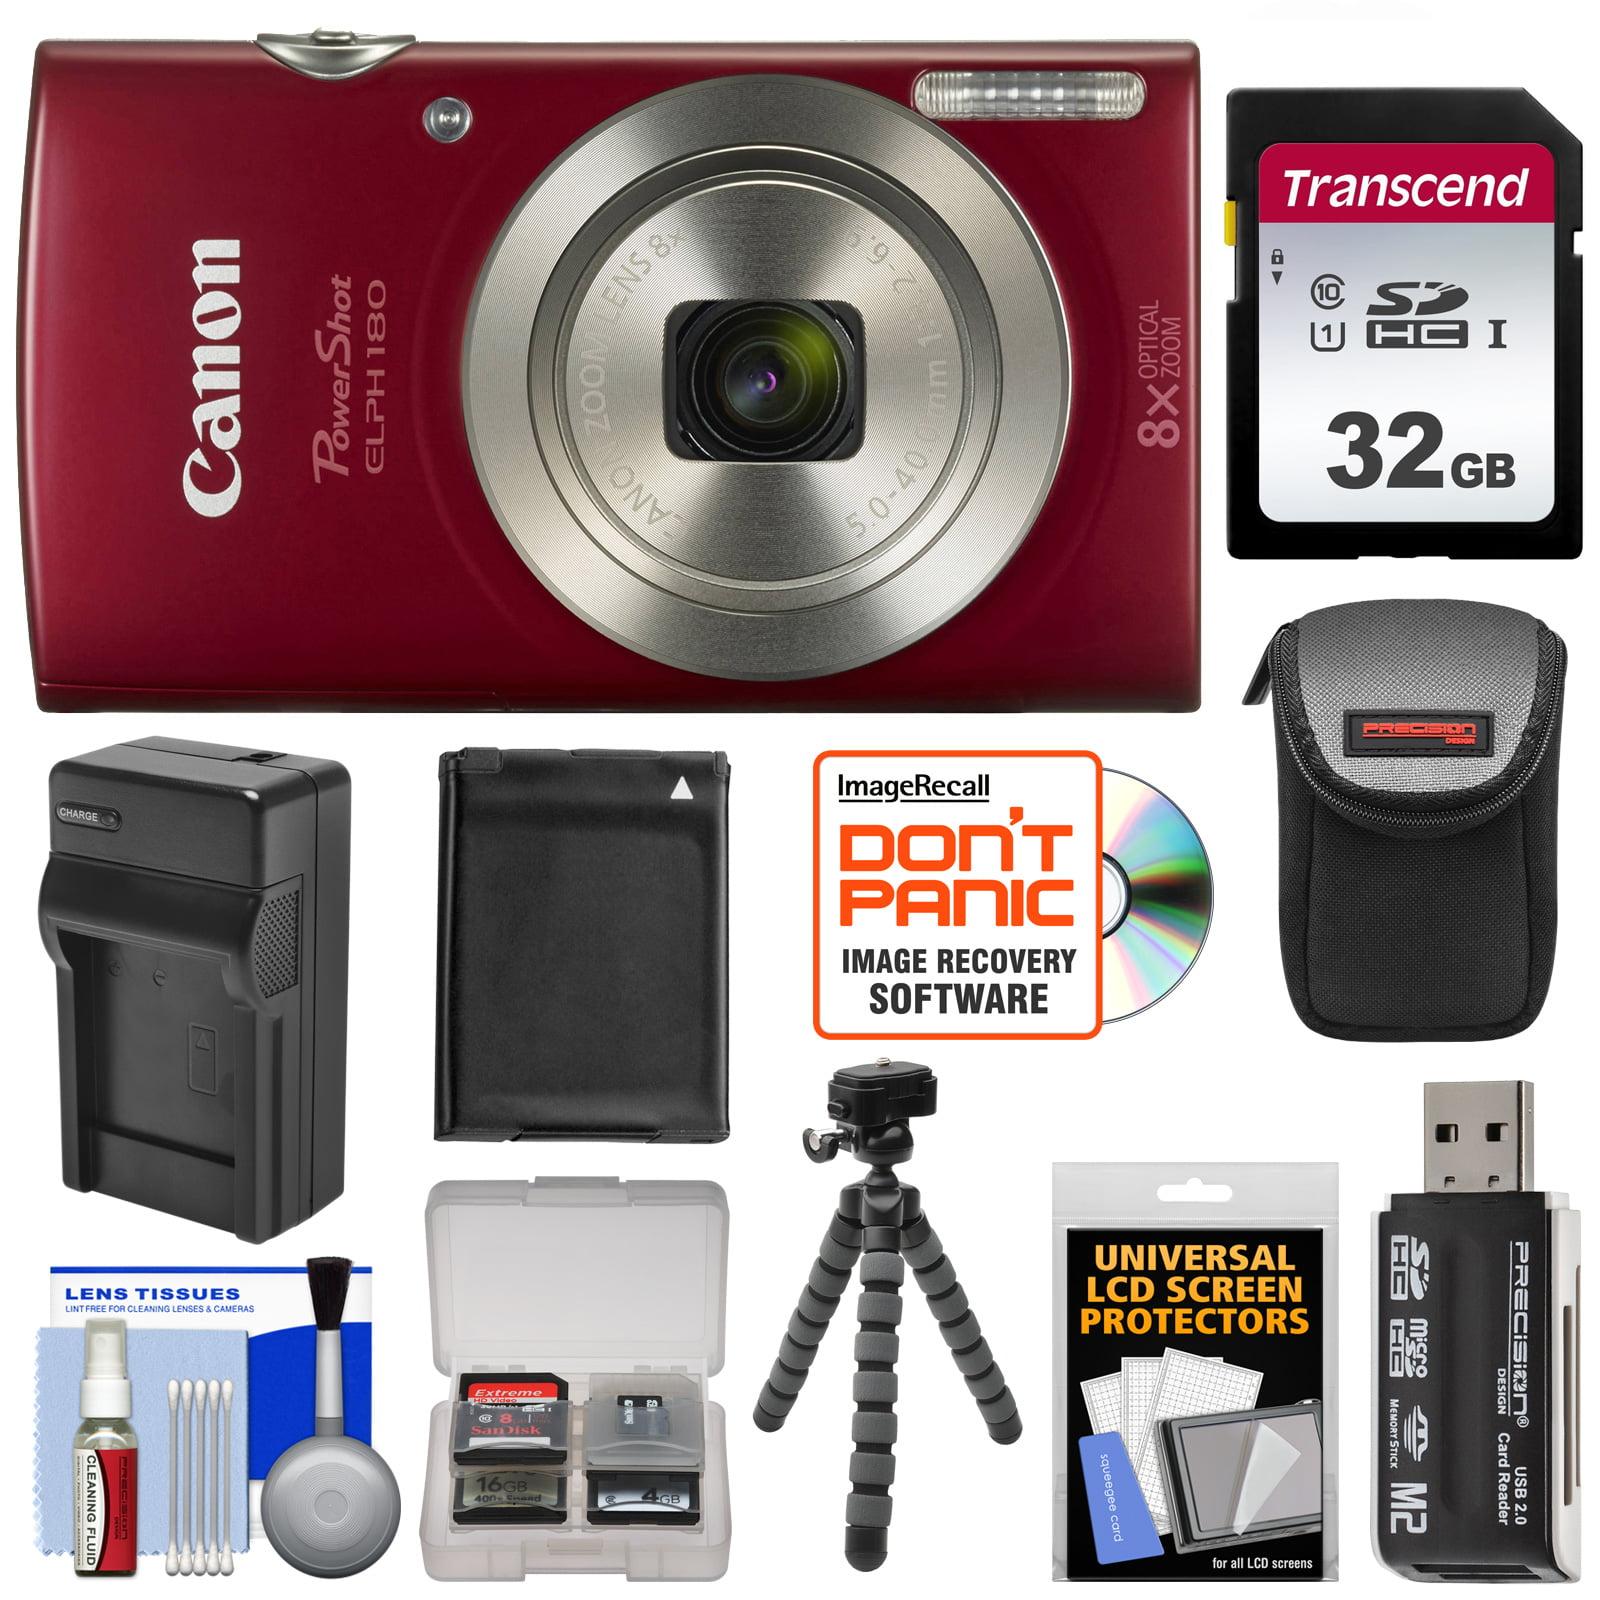 Cameras + Camcorders, Digital SLR, Mirror-less & HD Camcorders